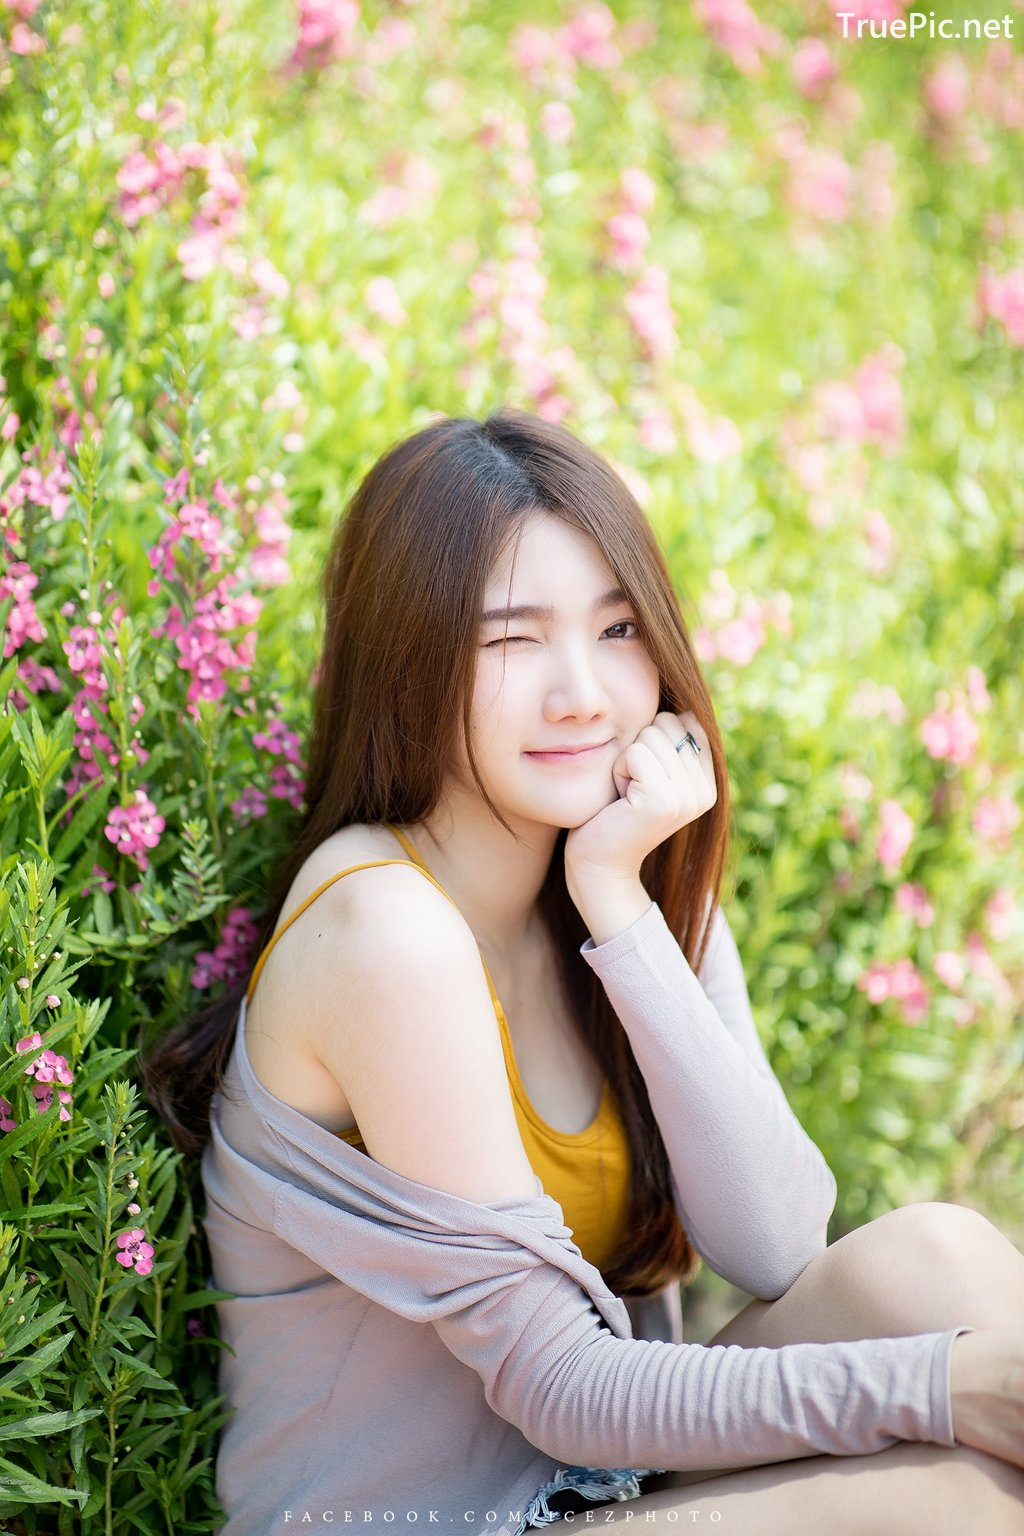 Image-Thailand-Cute-Model-Creammy-Chanama-Beautiful-Angel-In-Flower-Garden-TruePic.net- Picture-9